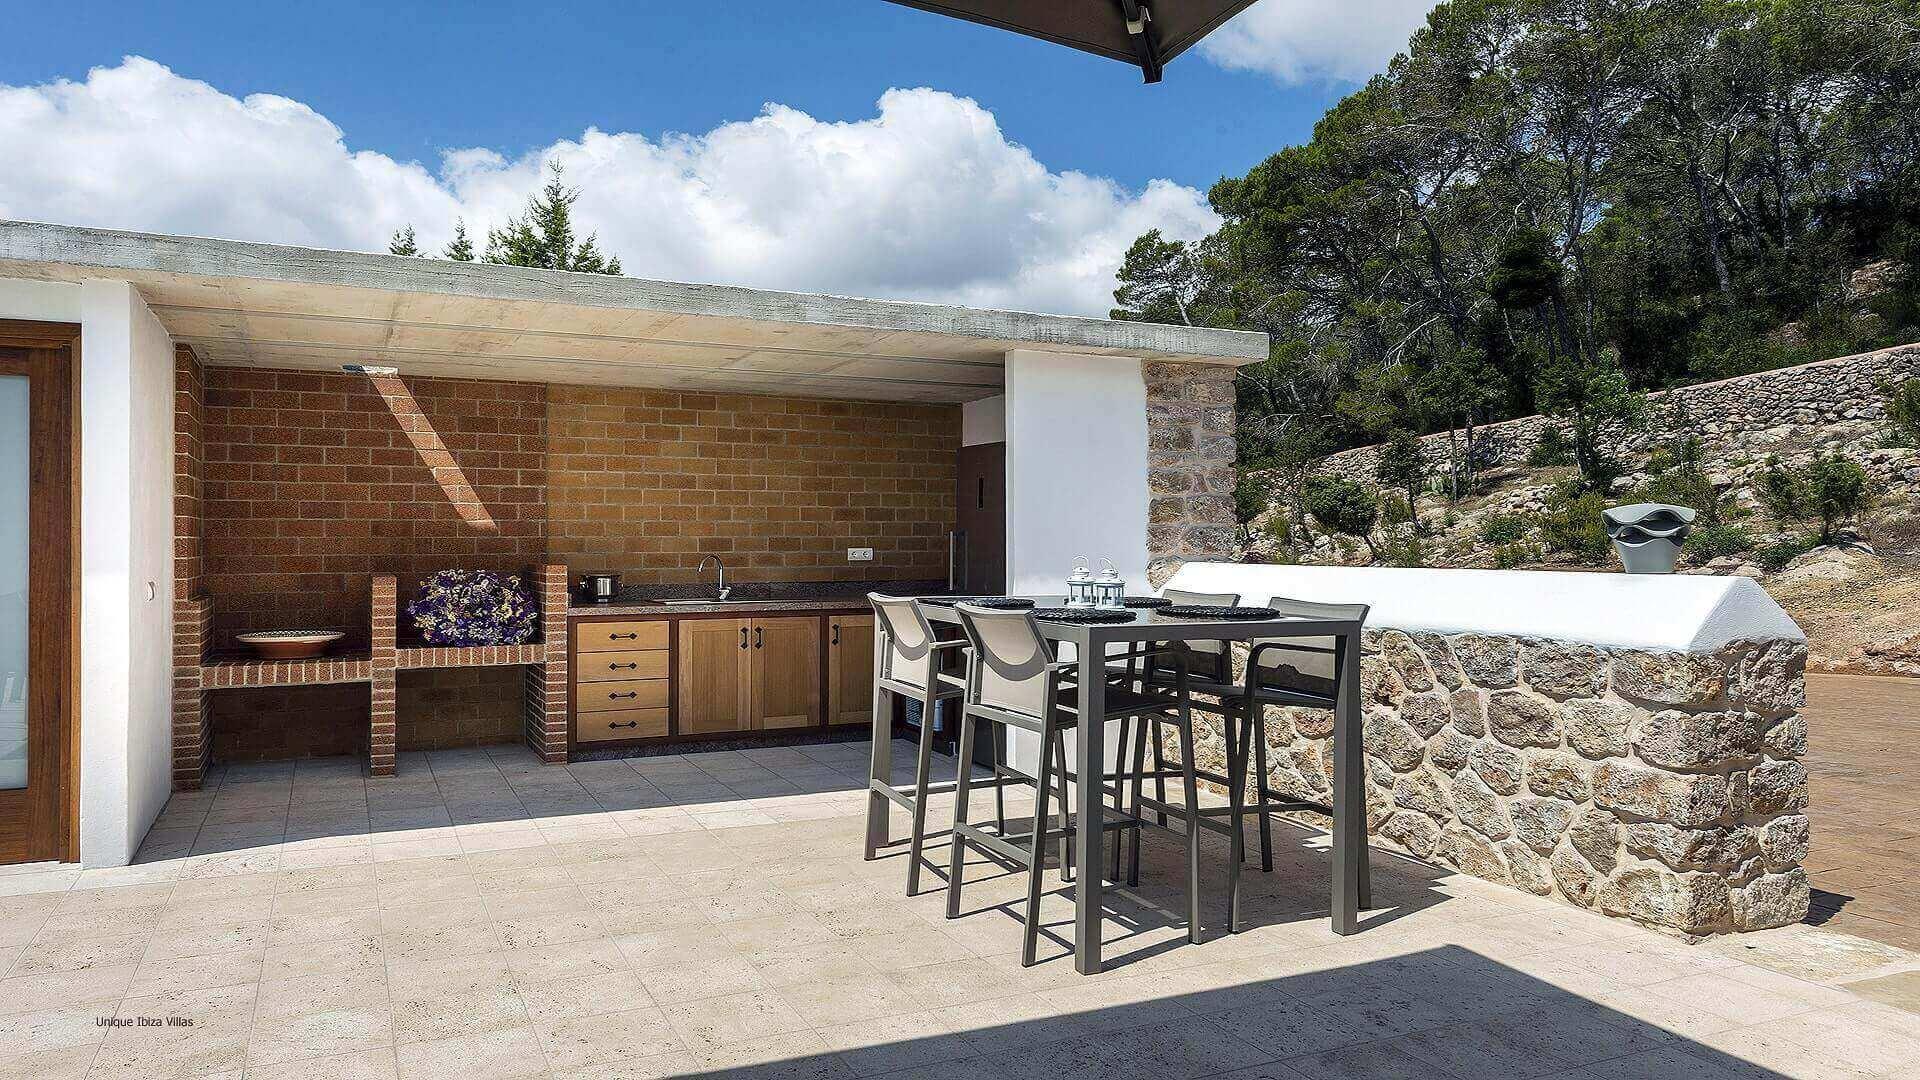 Casa Prats Ibiza 14 Santa Eulalia